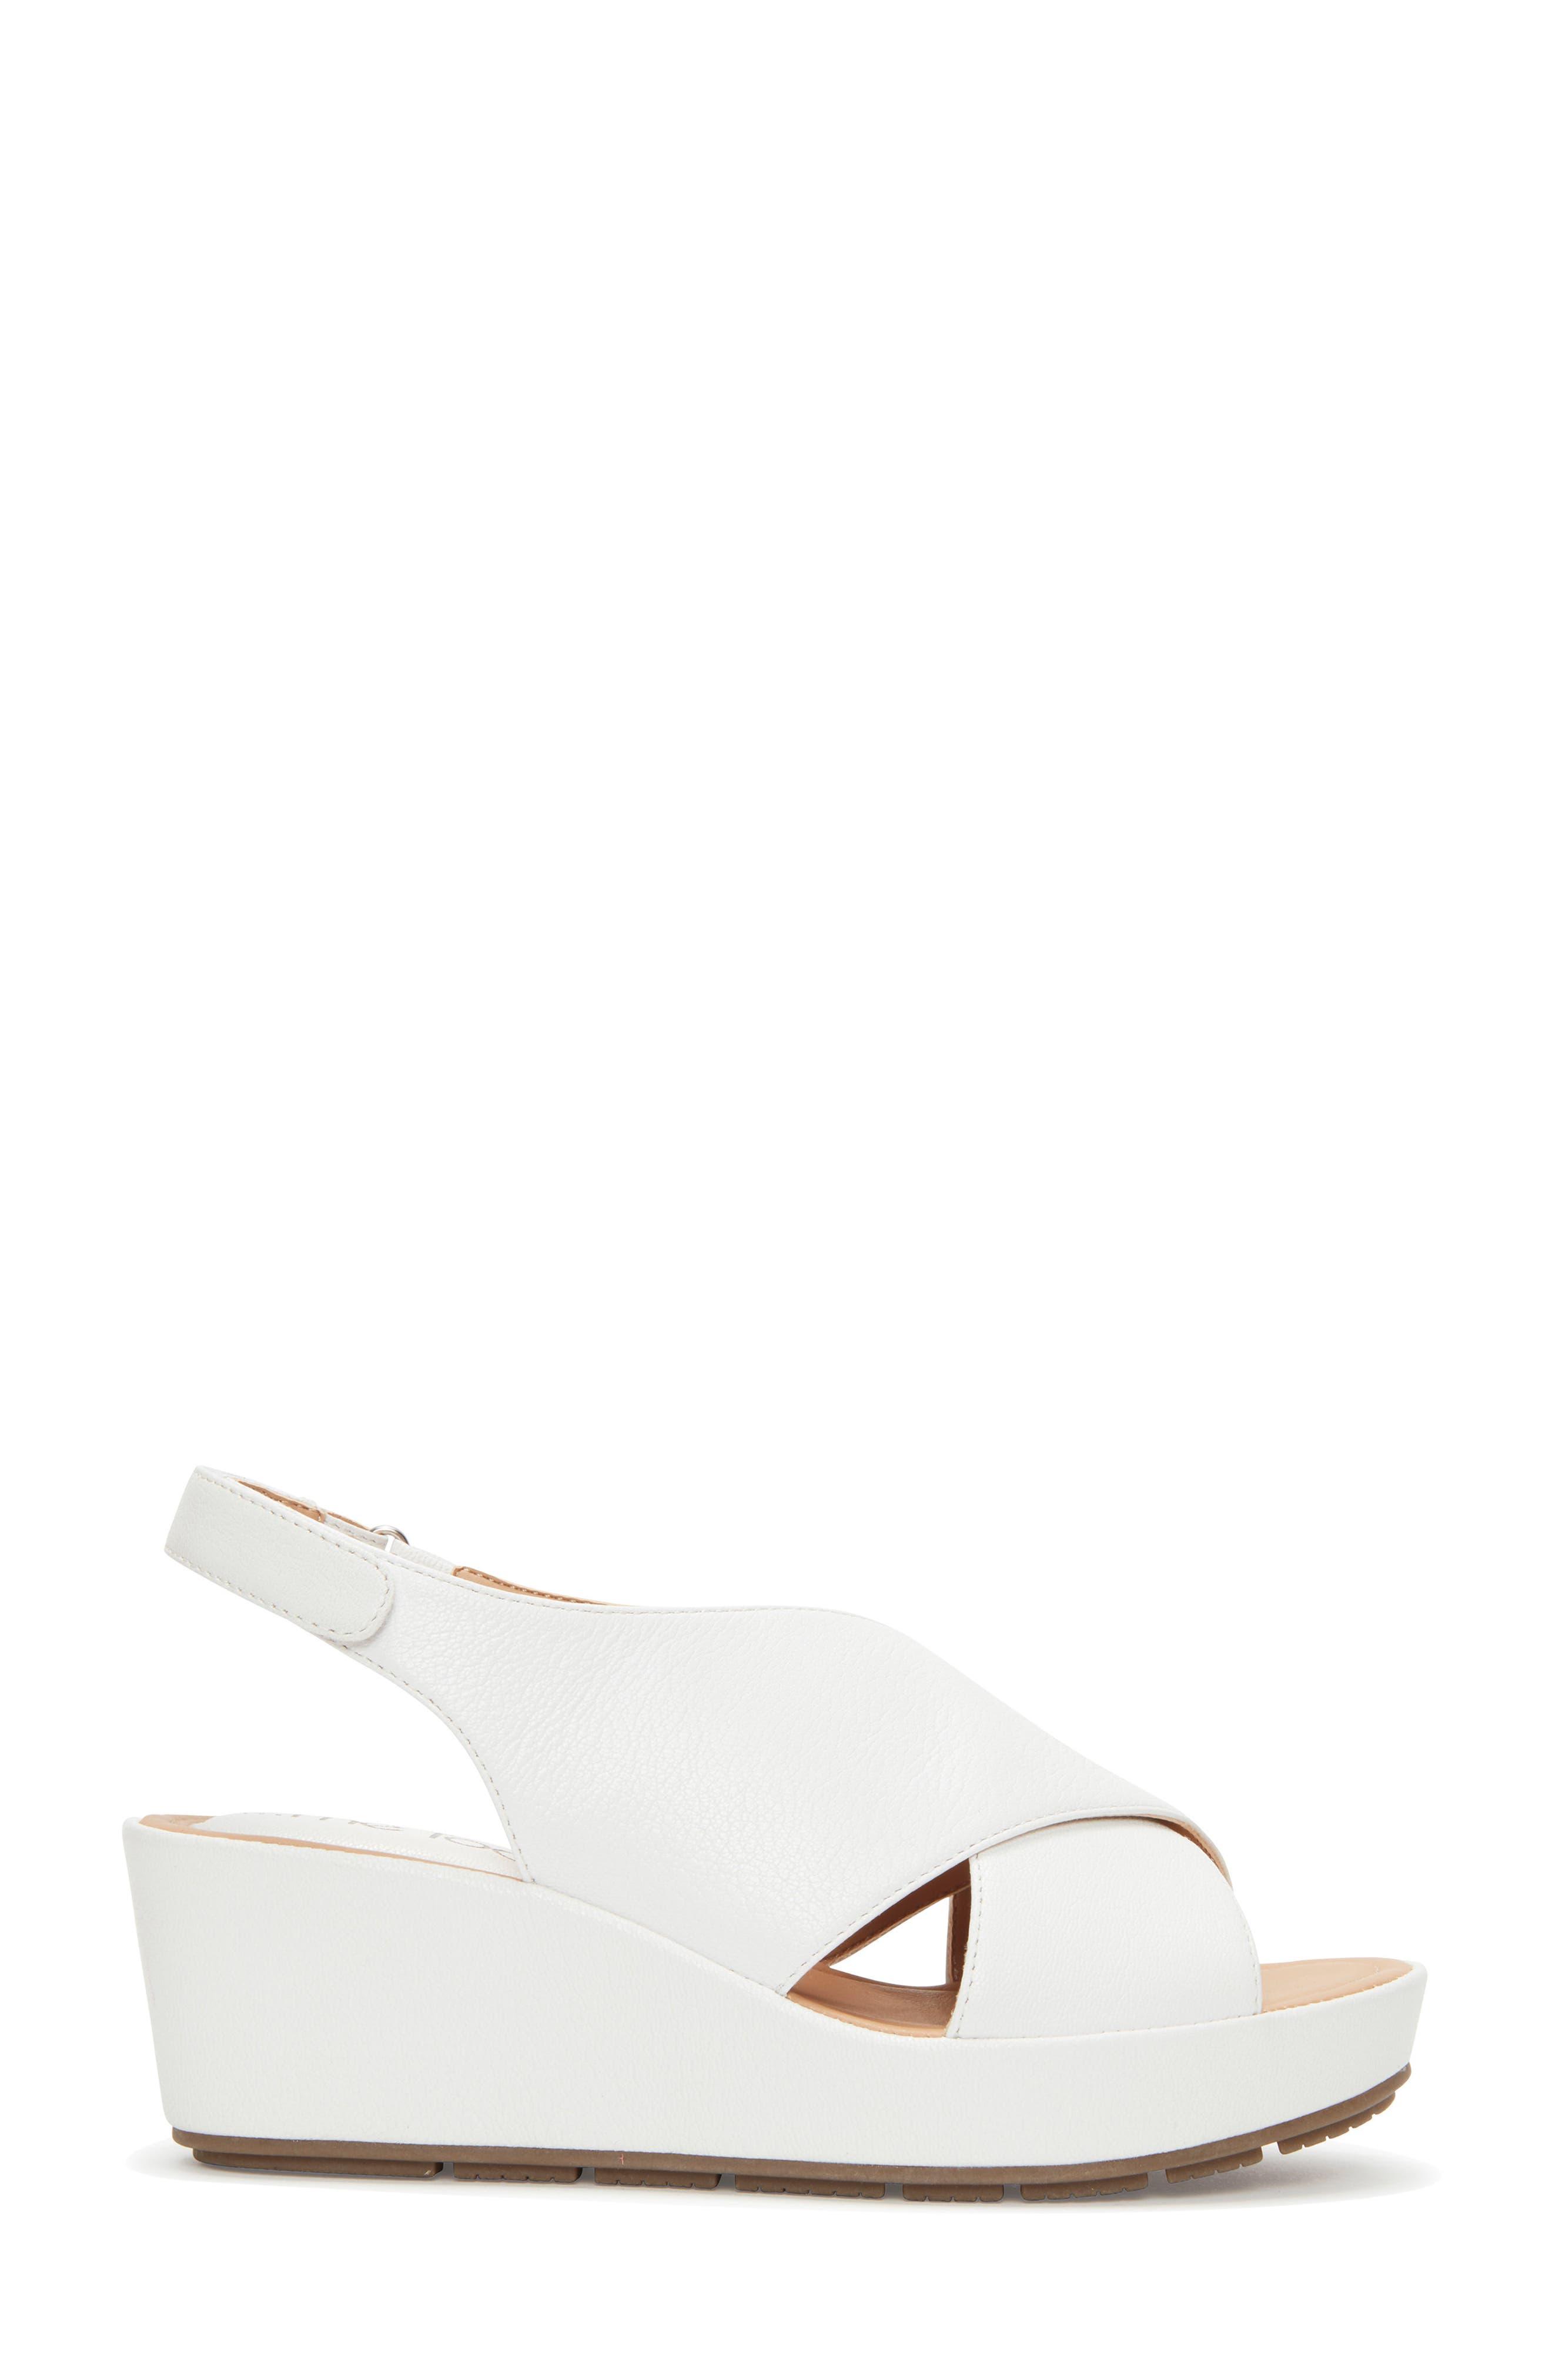 Arena Wedge Sandal,                             Alternate thumbnail 3, color,                             White Leather